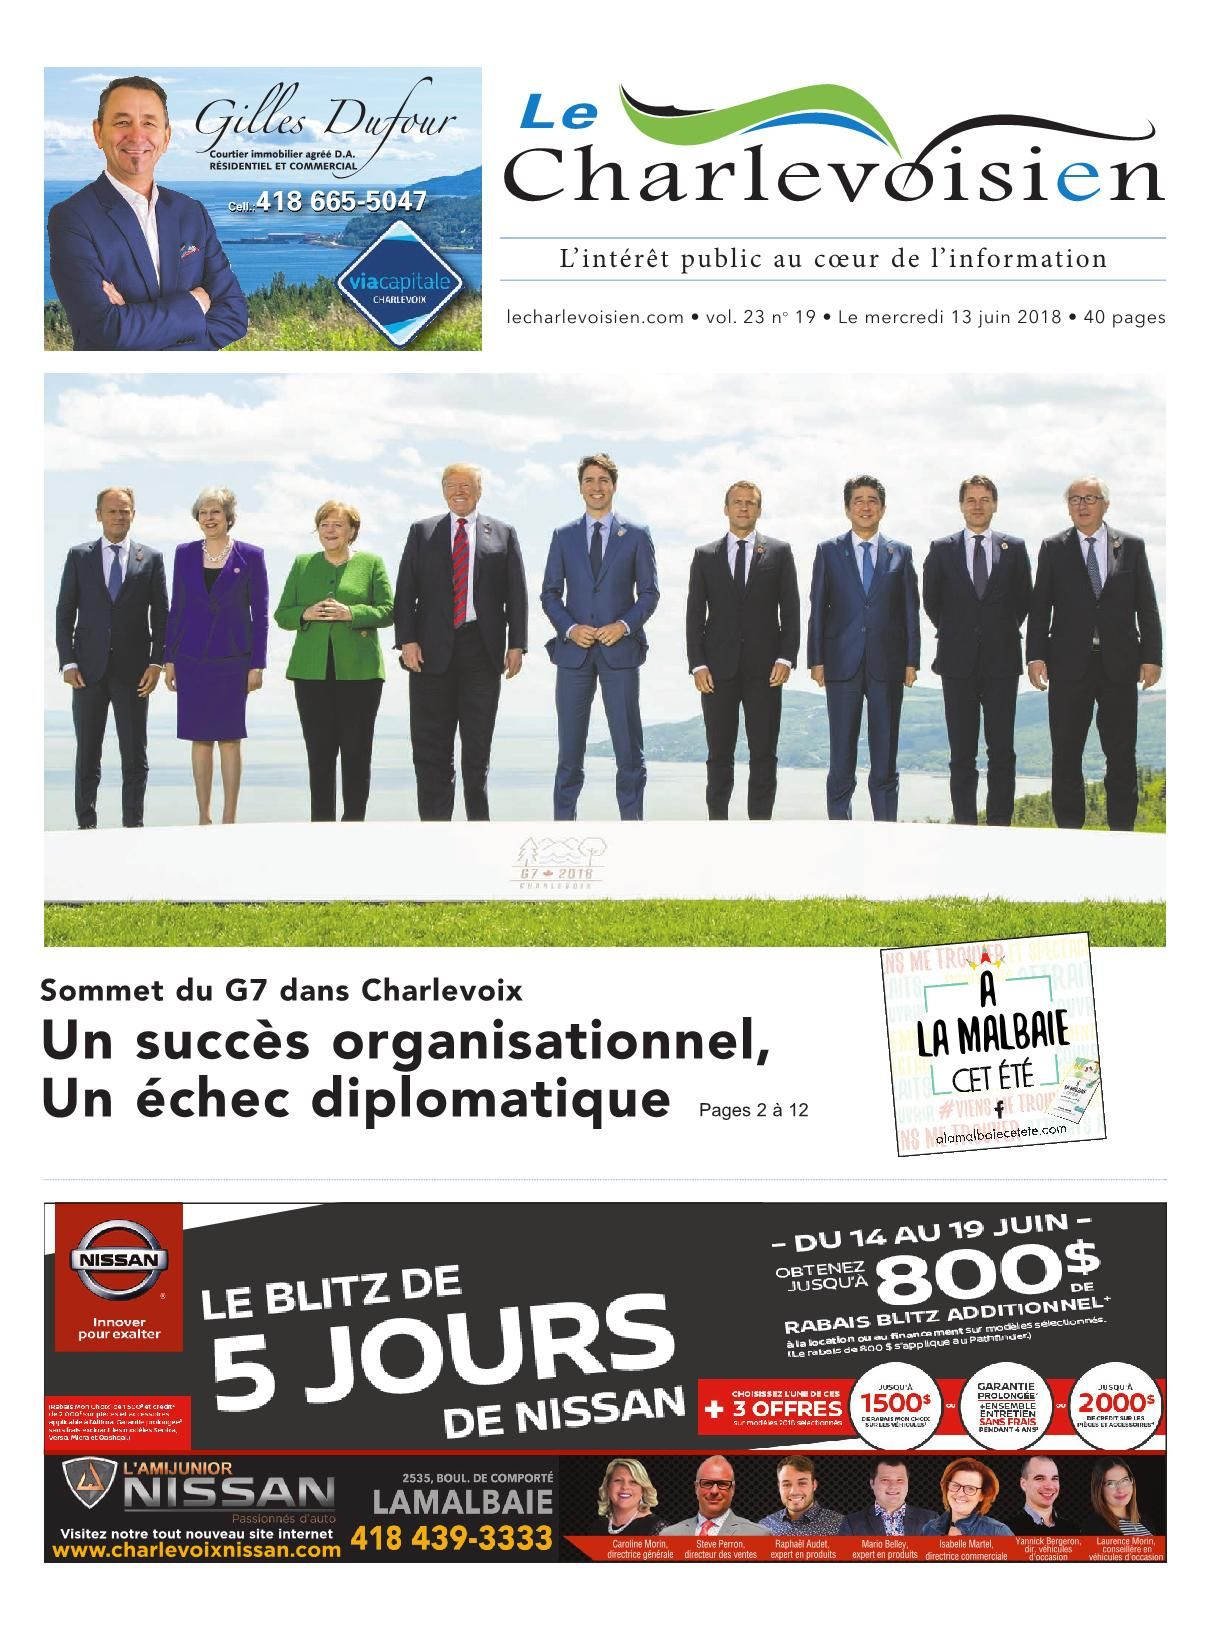 Enseigne Leclerc Inspirant Le Charlevoisien 13 Juin 2018 Pages 1 40 Text Version Of 24 Inspirant Enseigne Leclerc